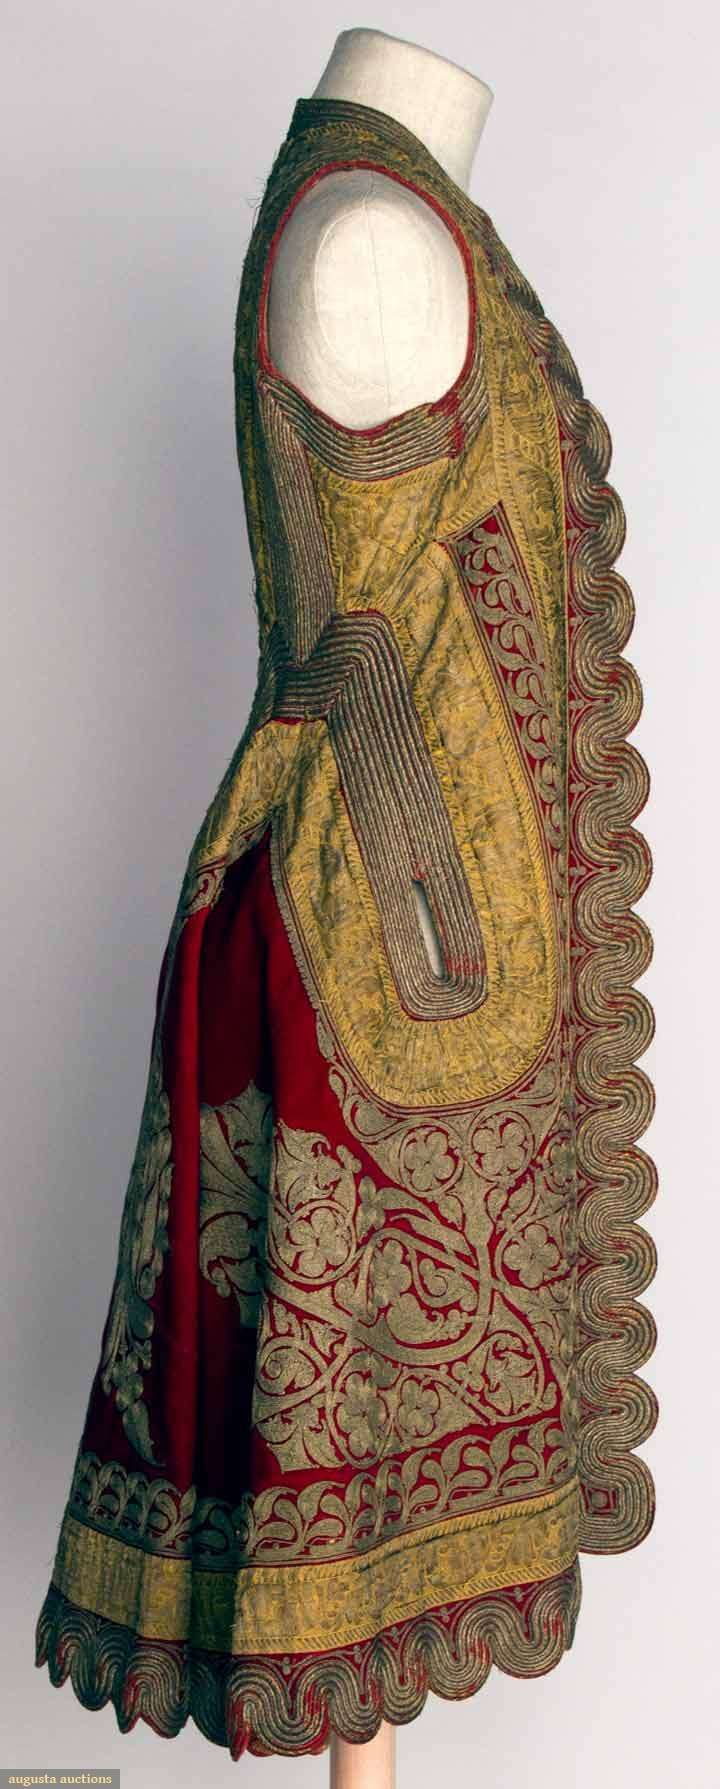 WOMAN'S SLEEVELESS COAT, ALBANIA, 19TH C Red wool w/ elaborate gold metallic embroidery & gilt trim, printed cotton lining